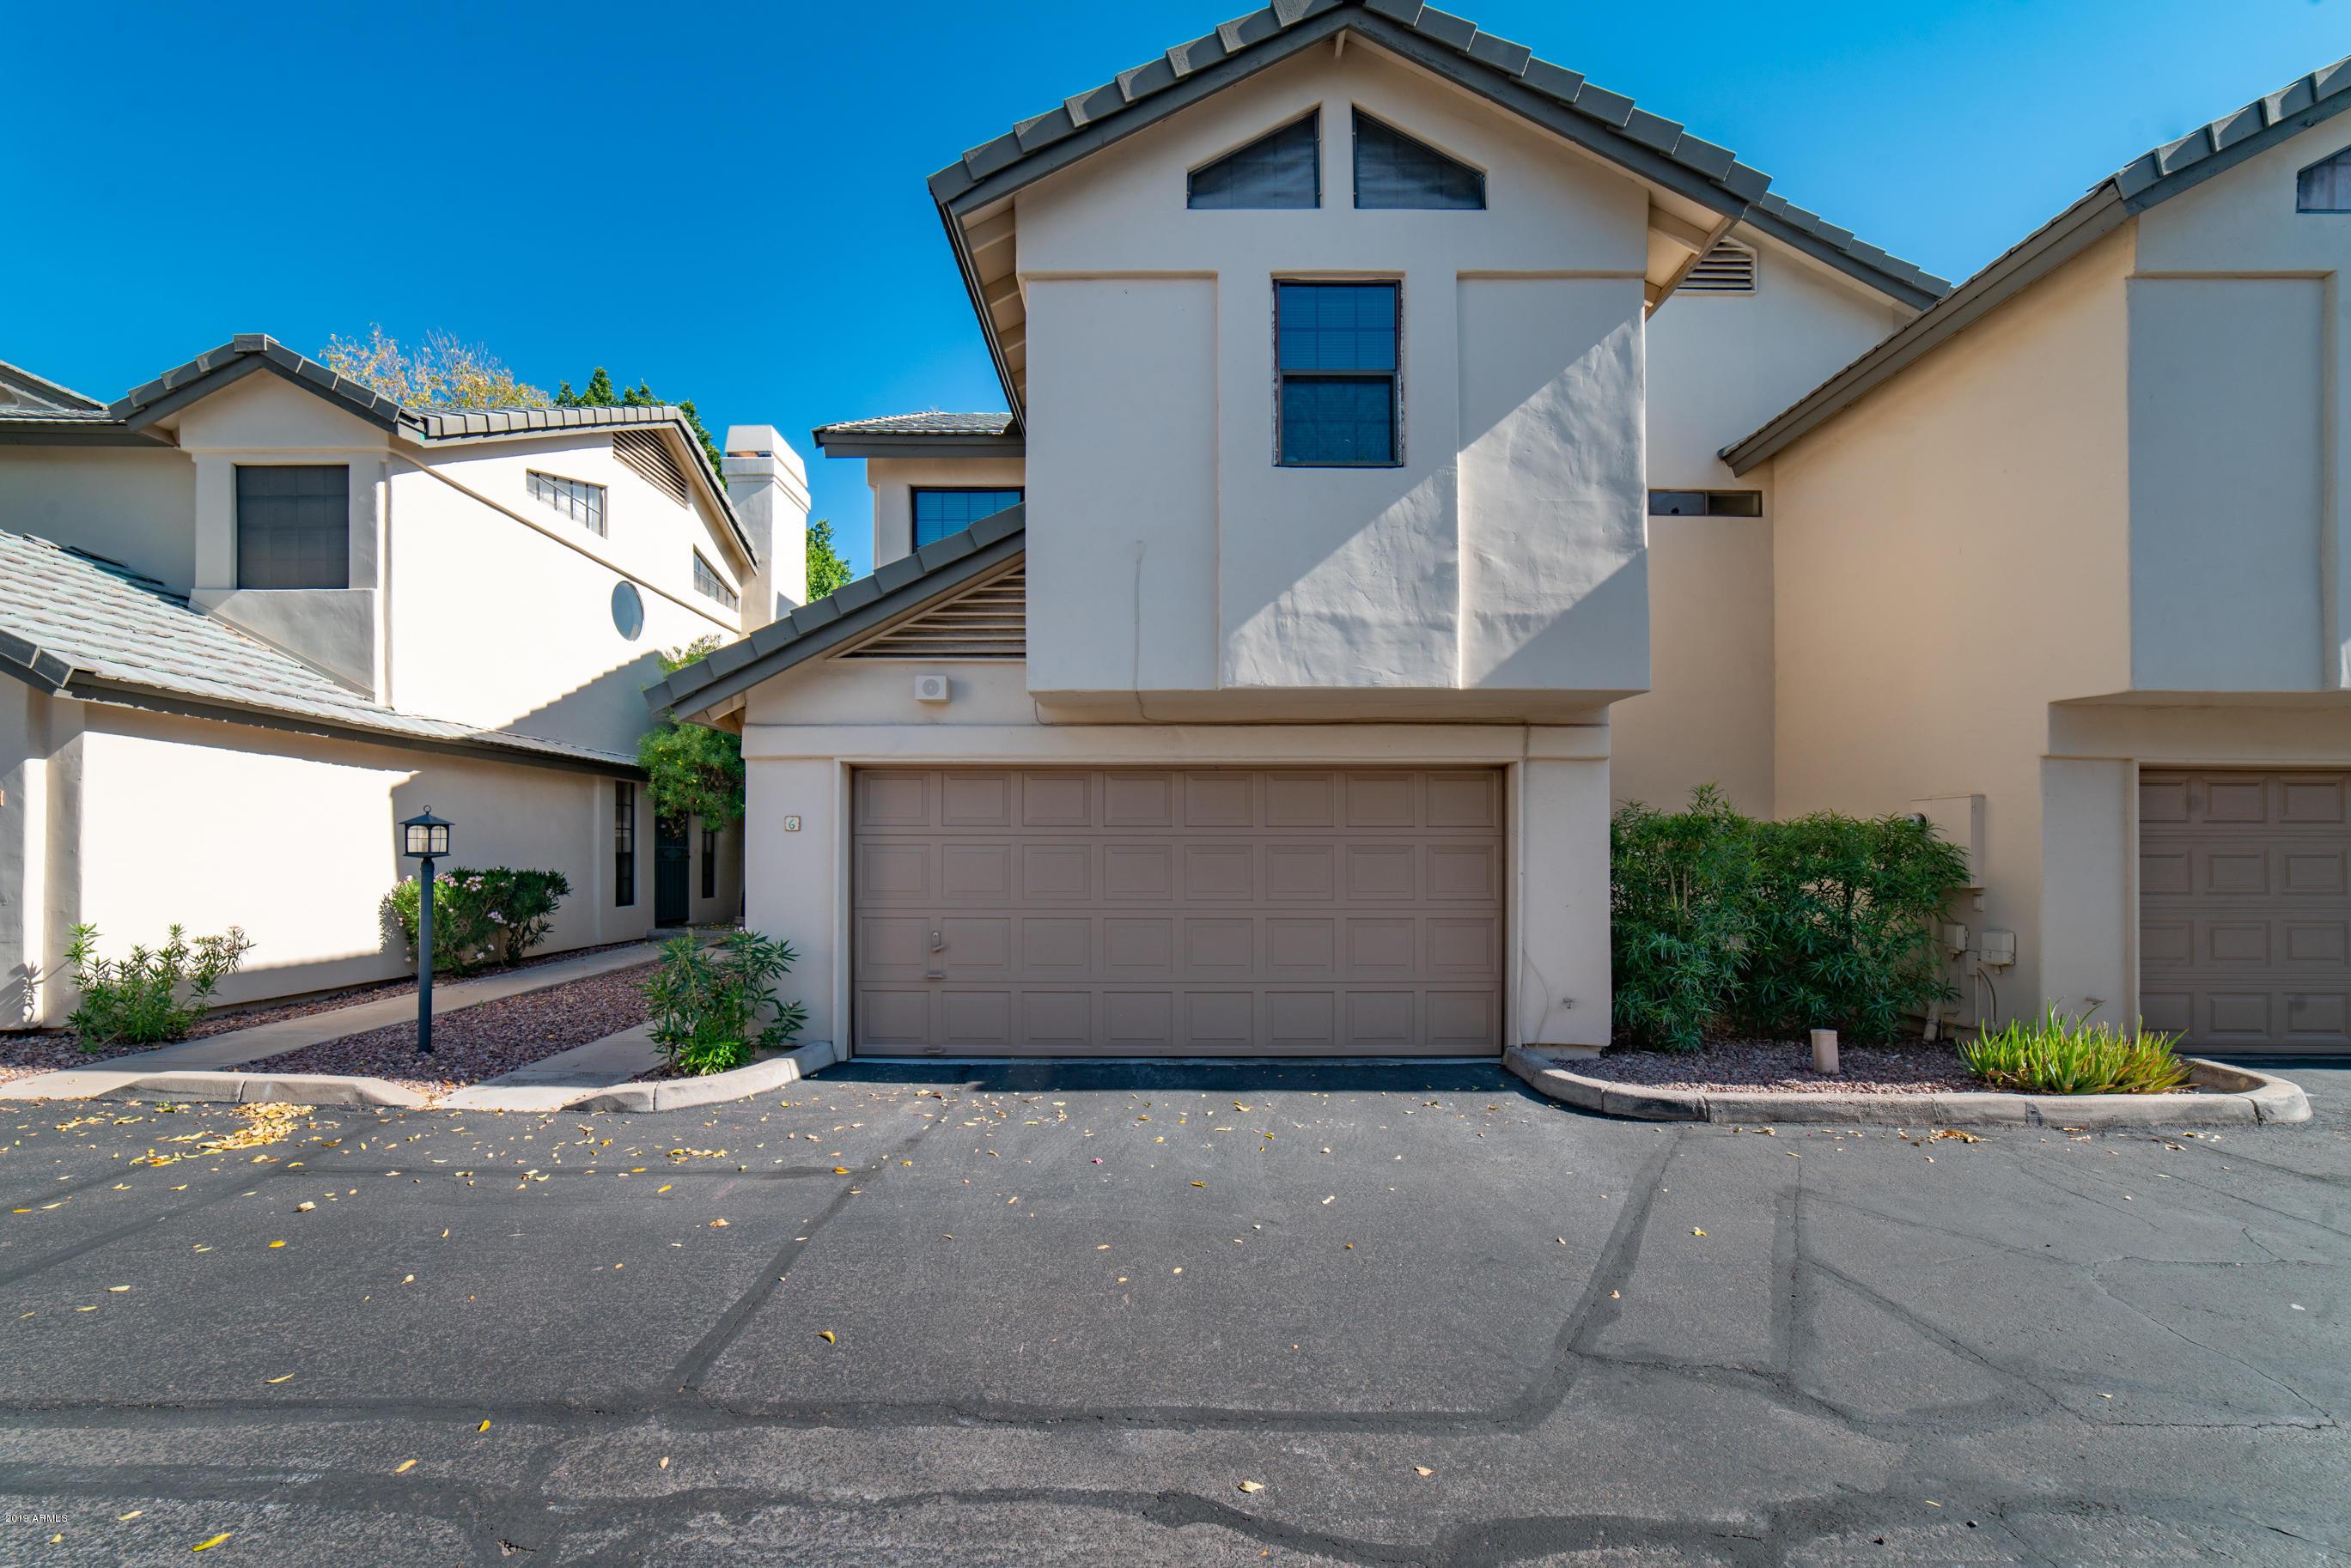 Photo of 1124 E ROSE Lane #6, Phoenix, AZ 85014